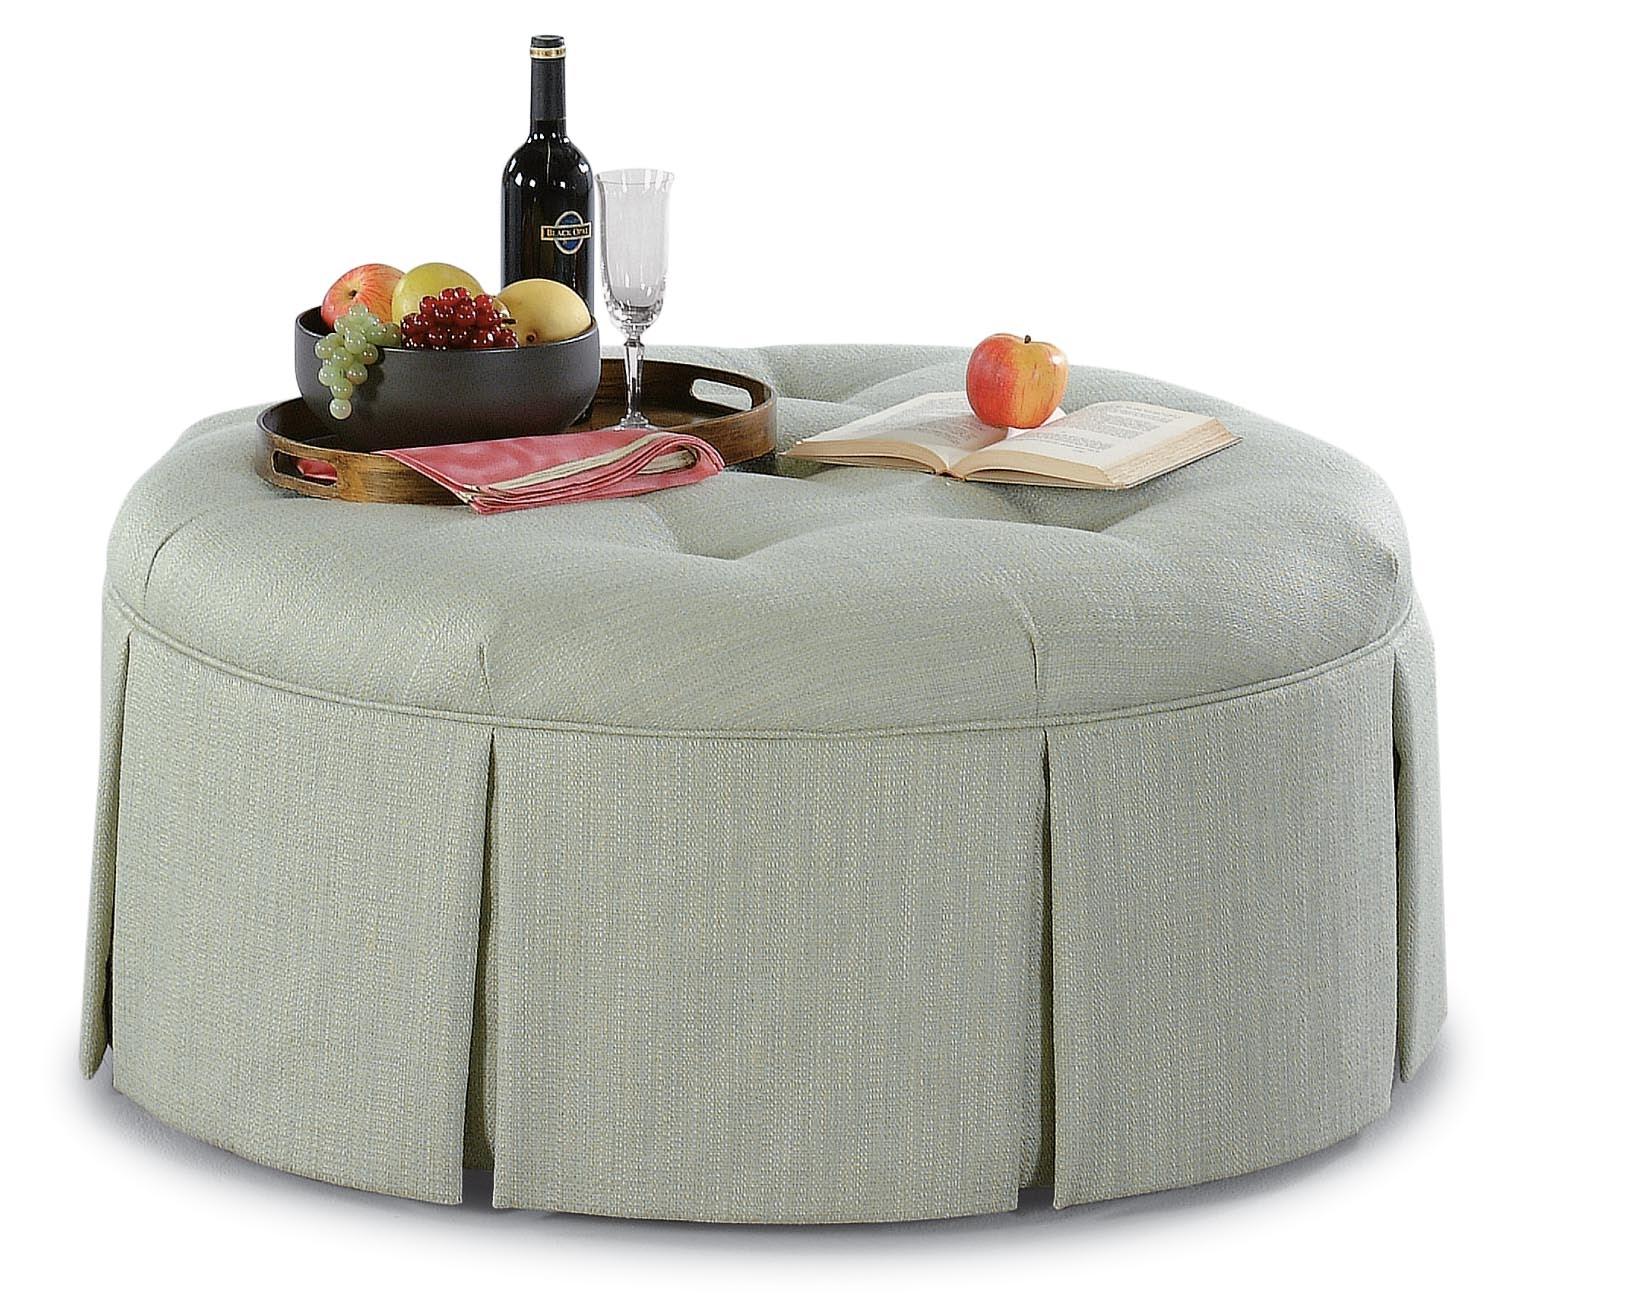 Large Round Ottoman 644-009